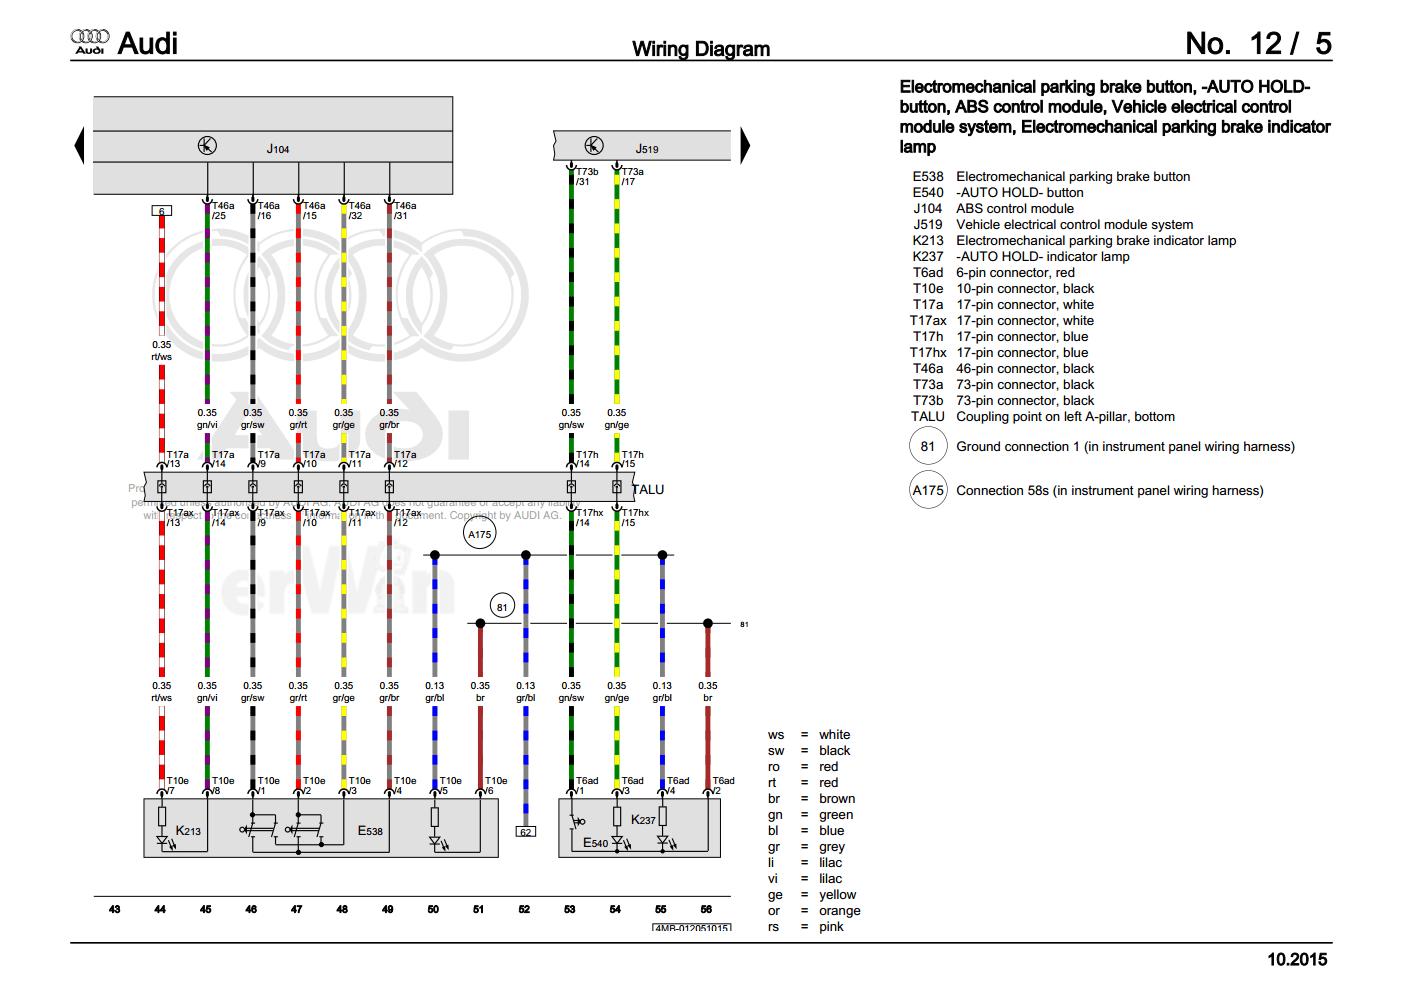 [DIAGRAM] Audi Q5 Wiring Diagram 2015 FULL Version HD